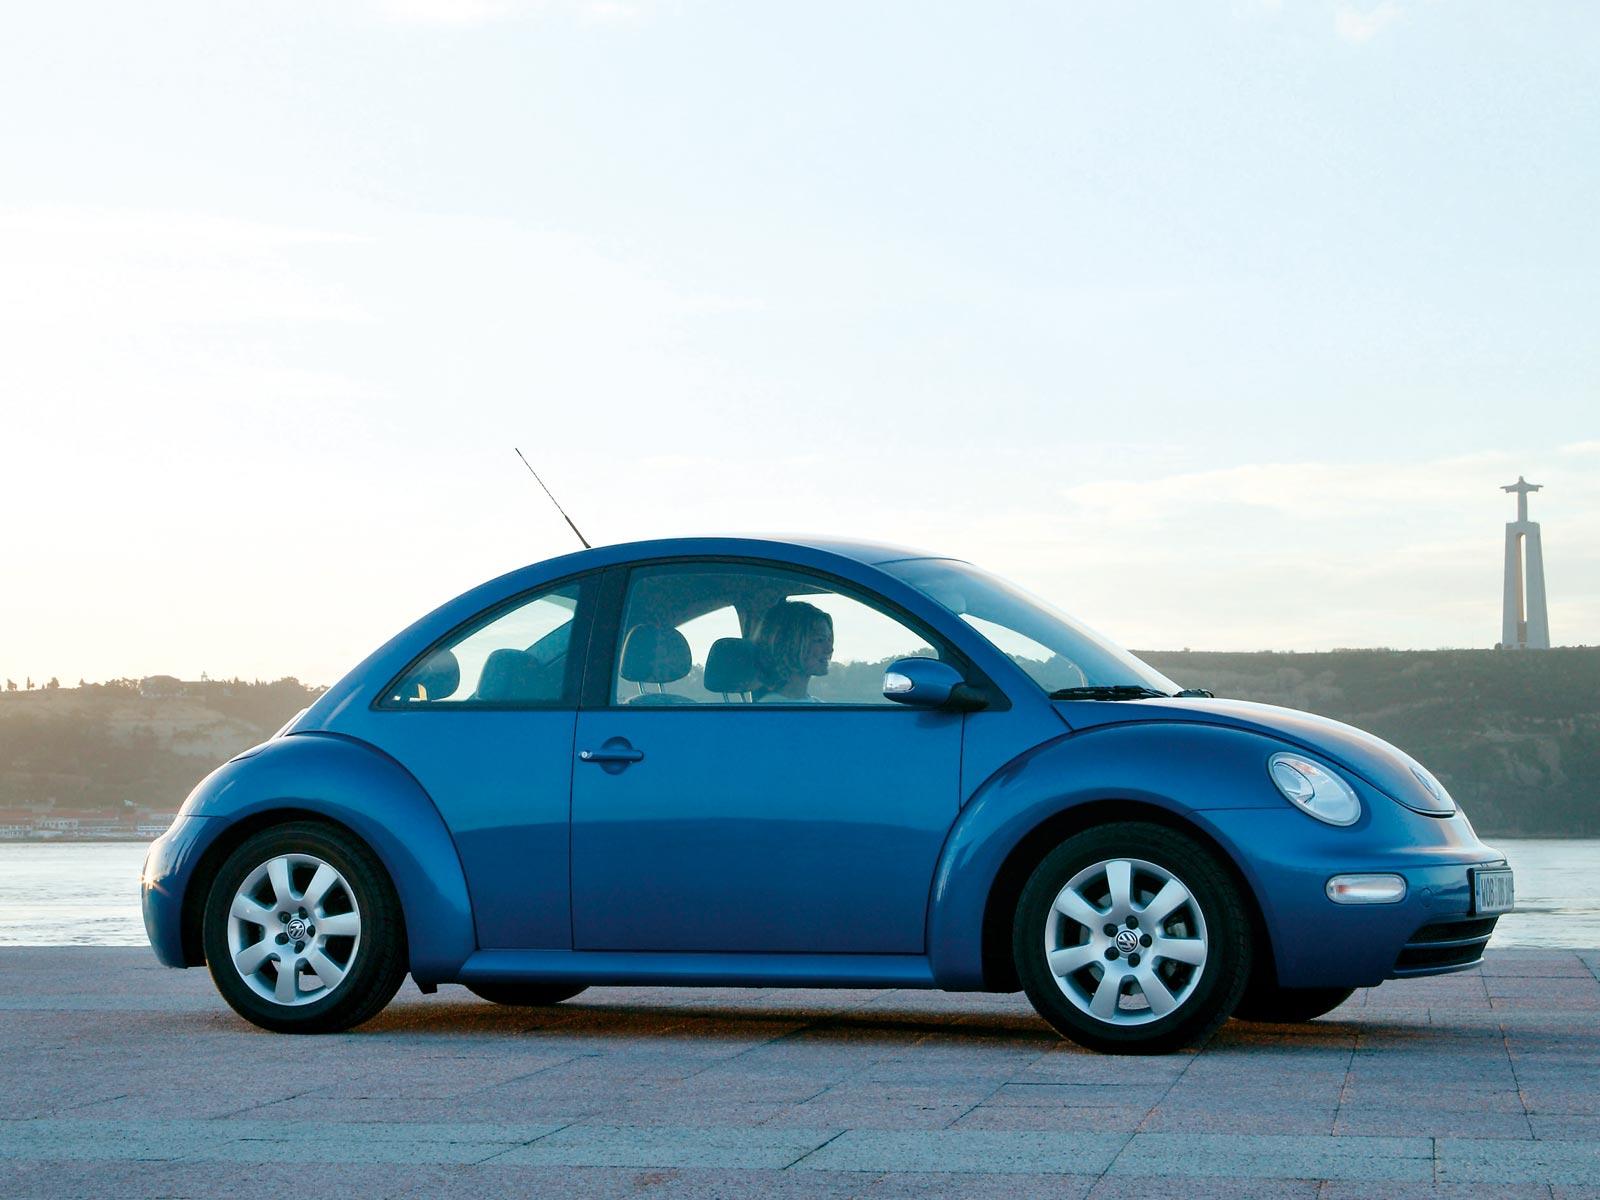 1998 2011 vw new beetle autoguru. Black Bedroom Furniture Sets. Home Design Ideas